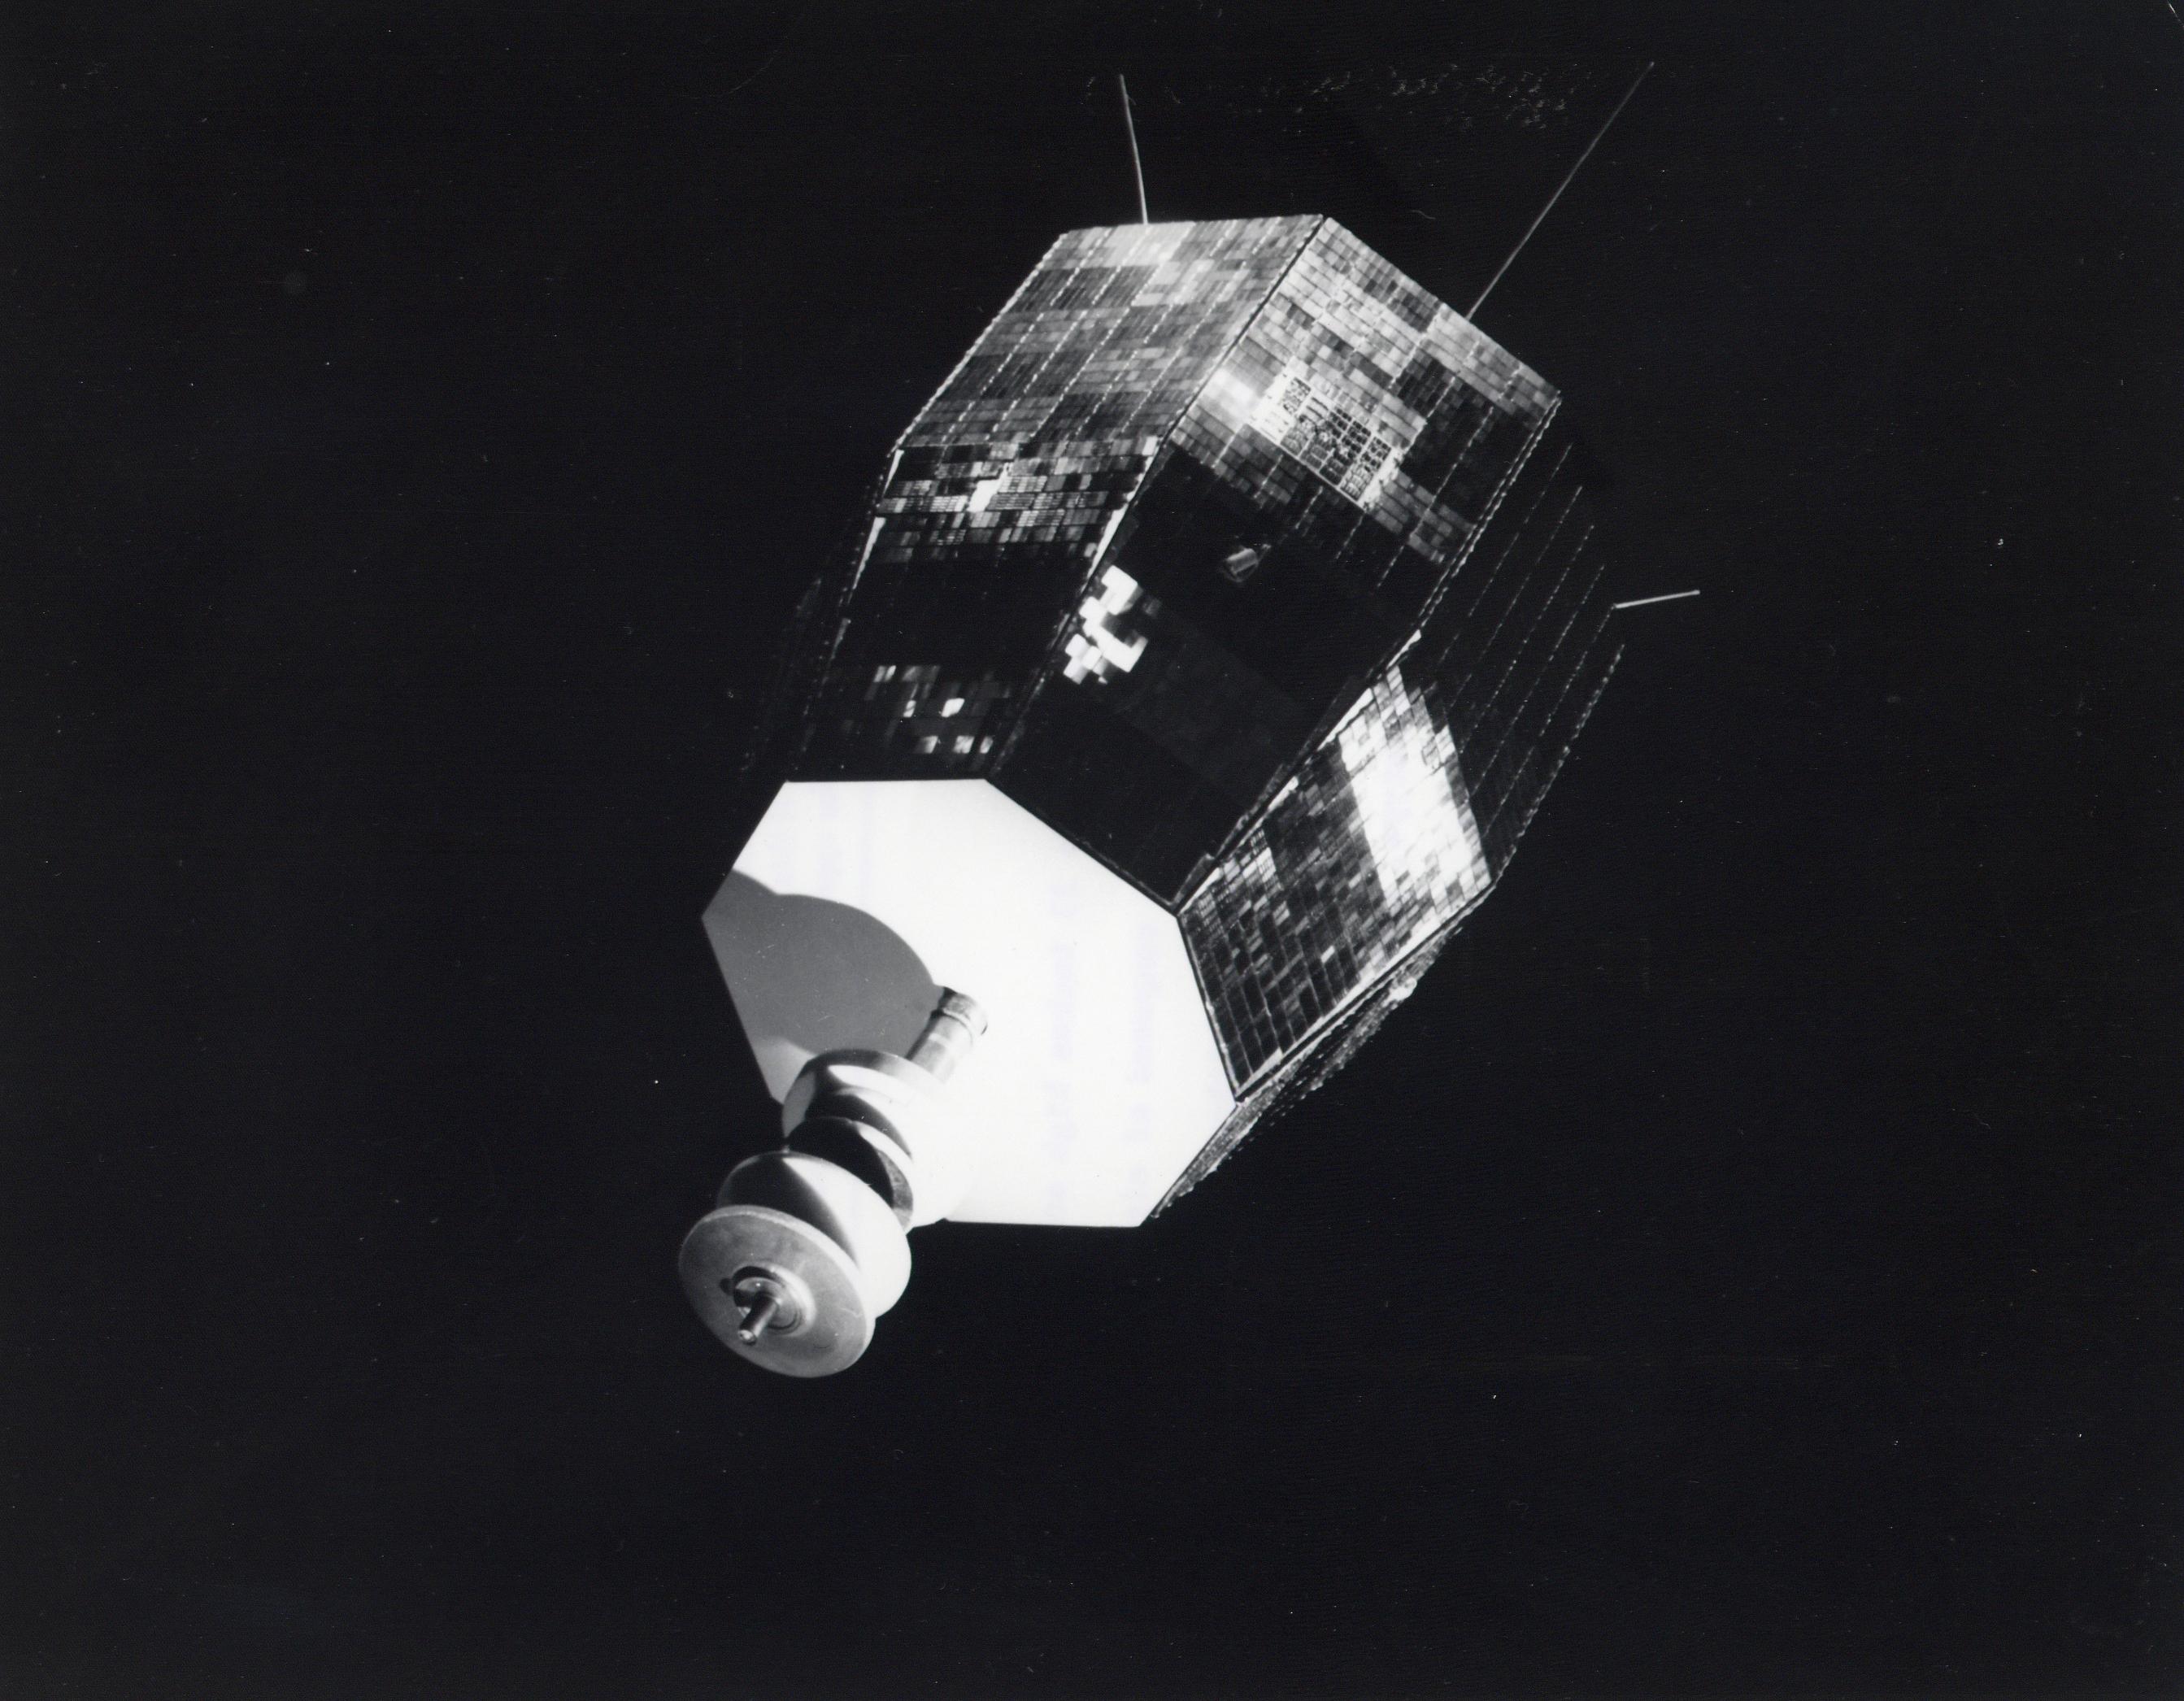 nasa 1964 - photo #24